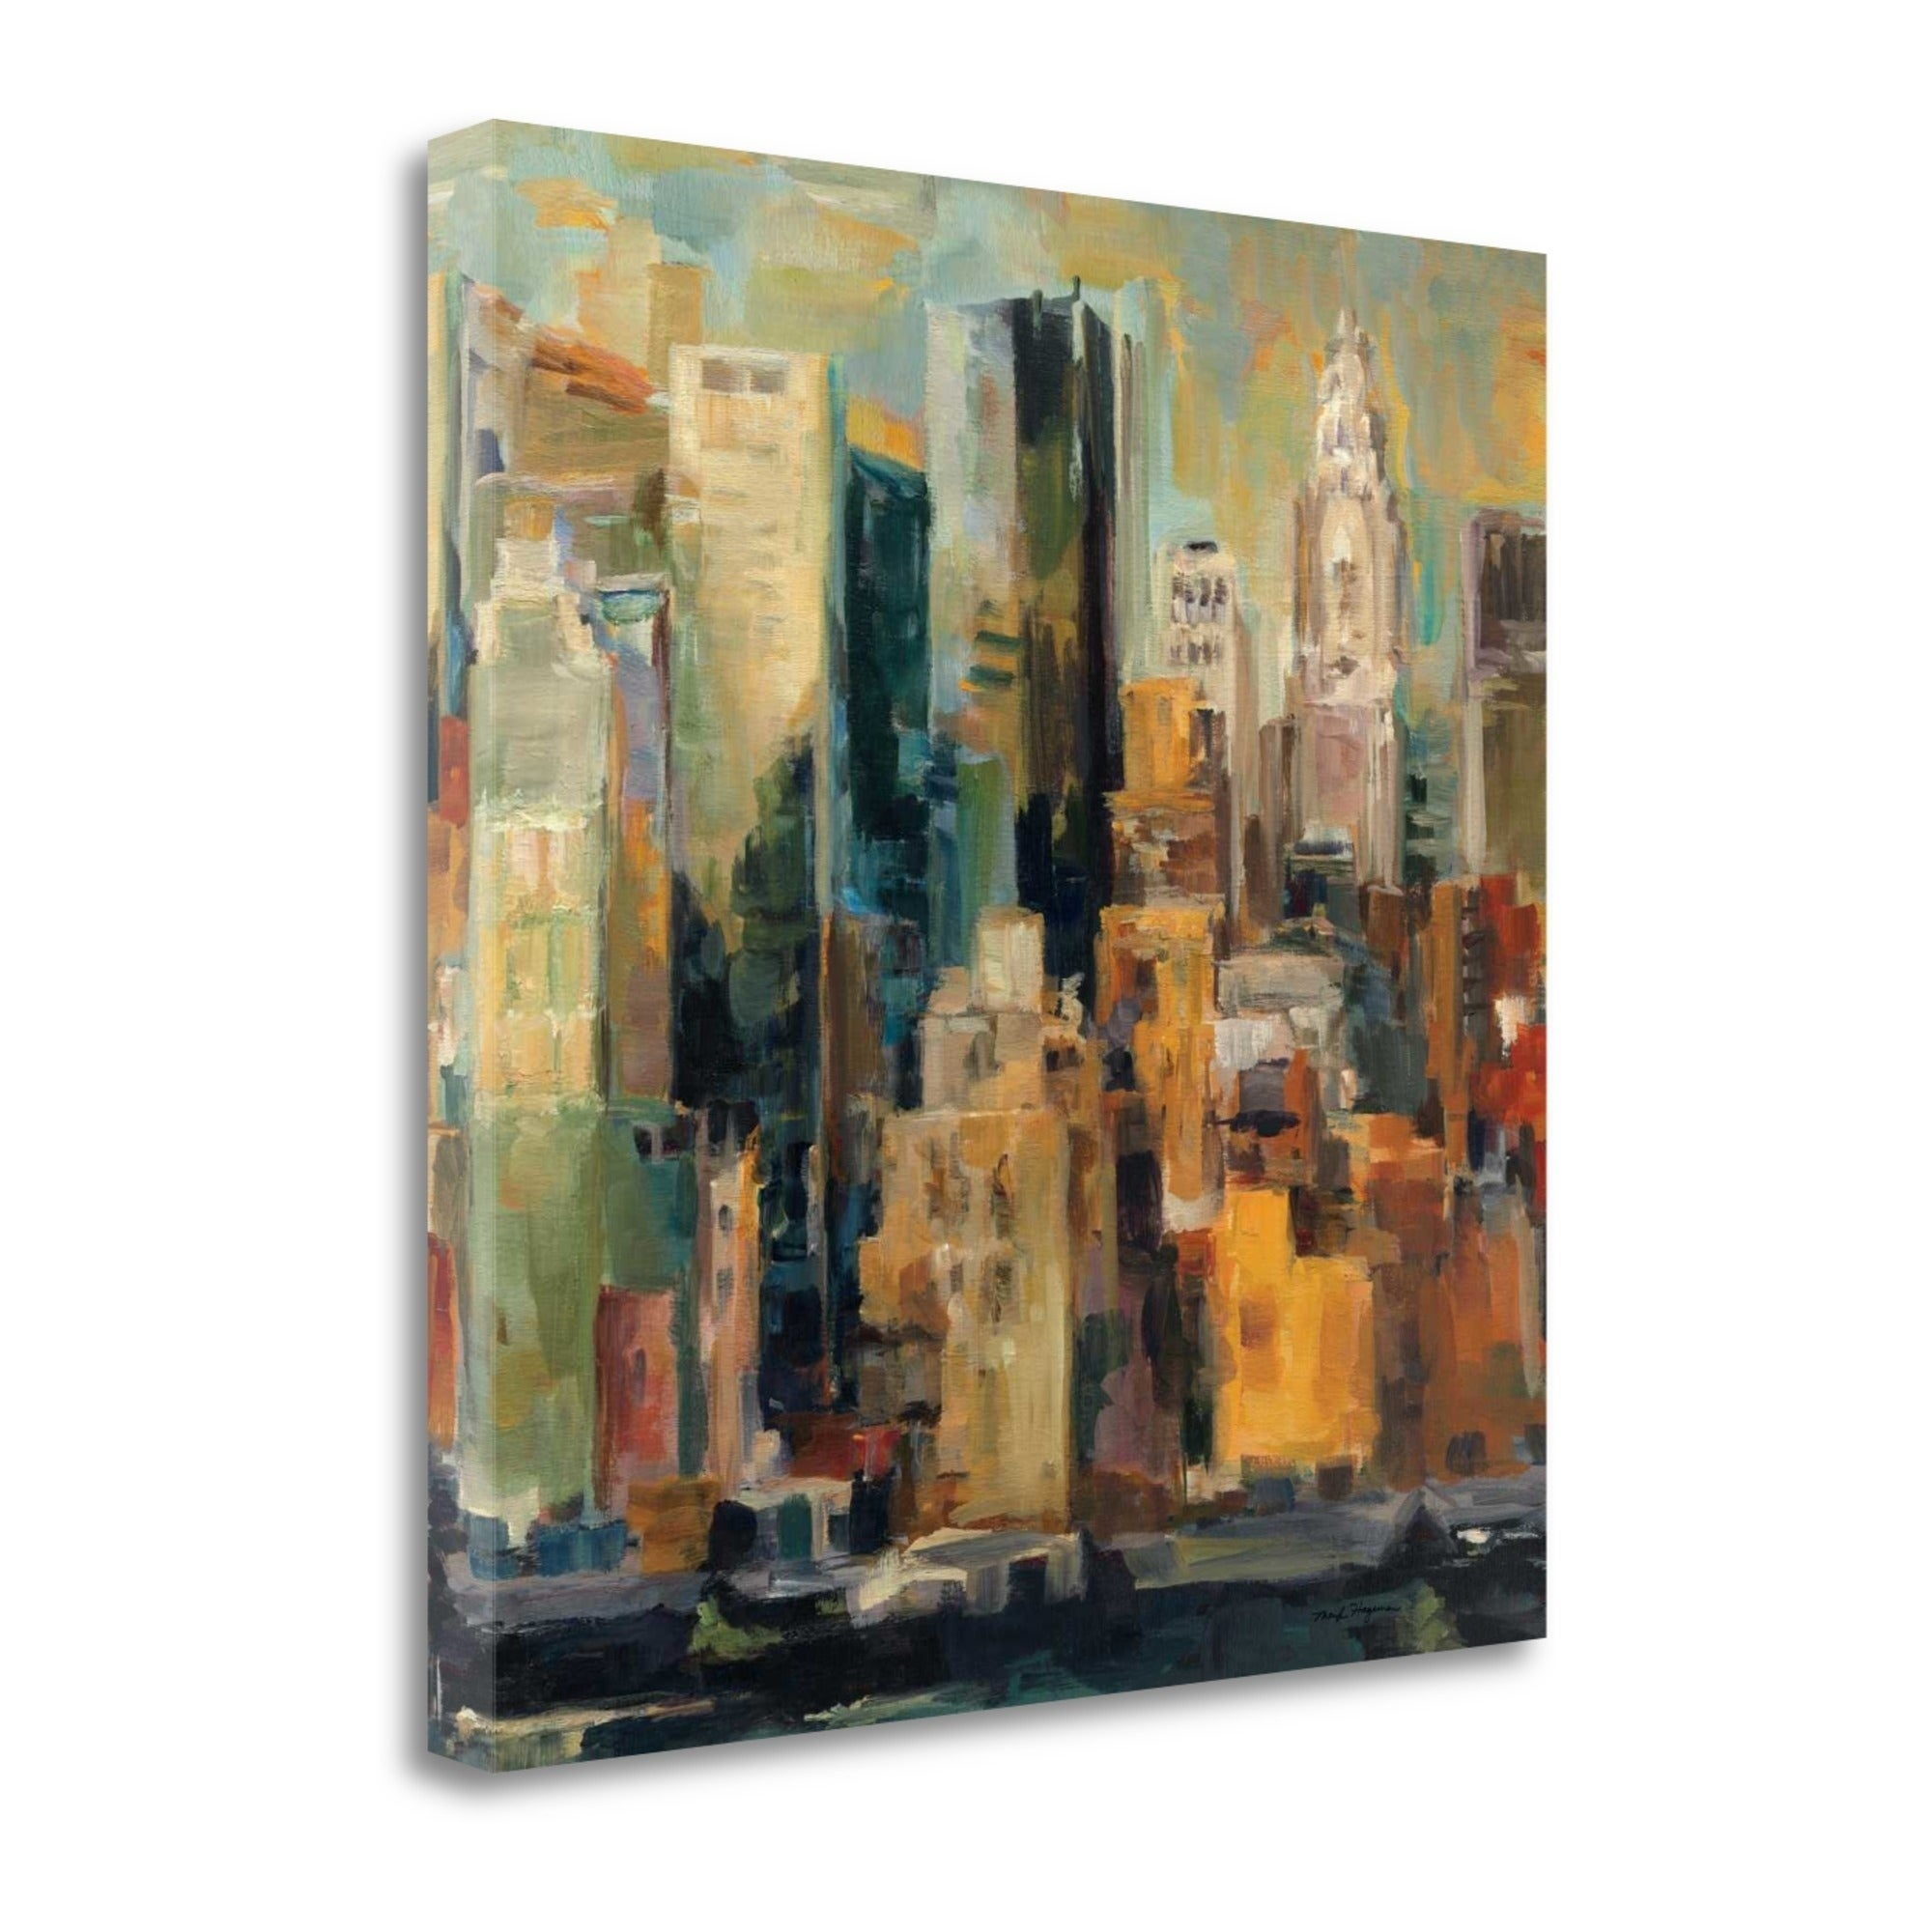 New York New York by Marilyn Hageman 35x35 Art Print Manhattan Skyline Abstract